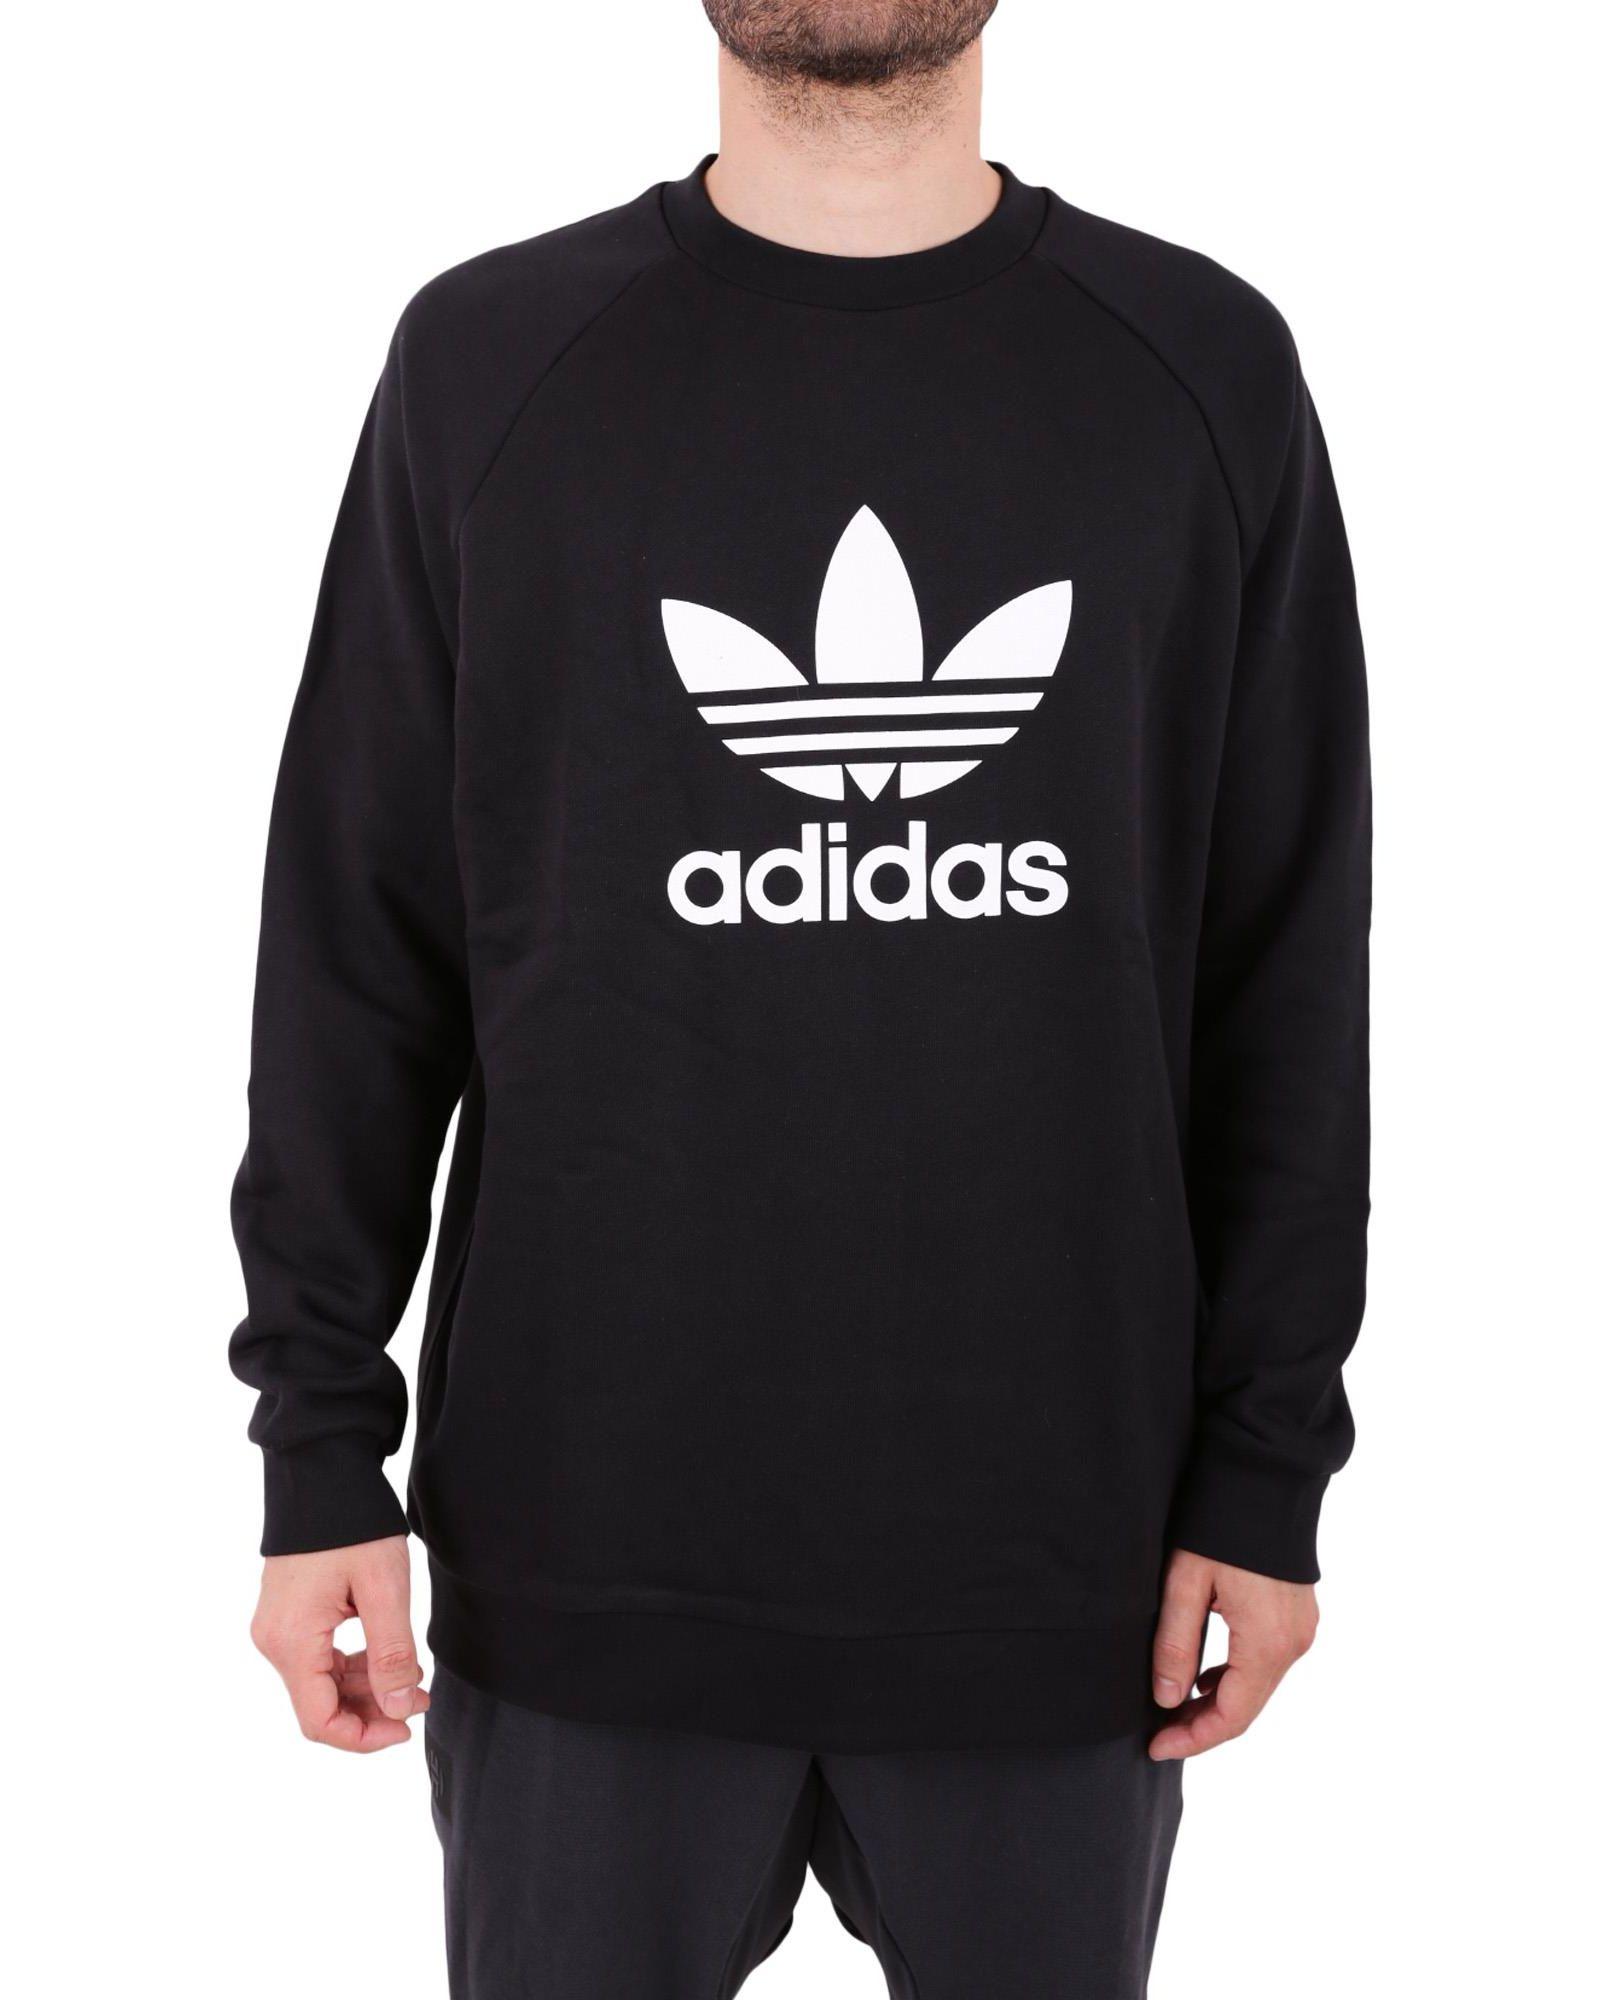 Adidas Trefoil Cotton Sweatshirt